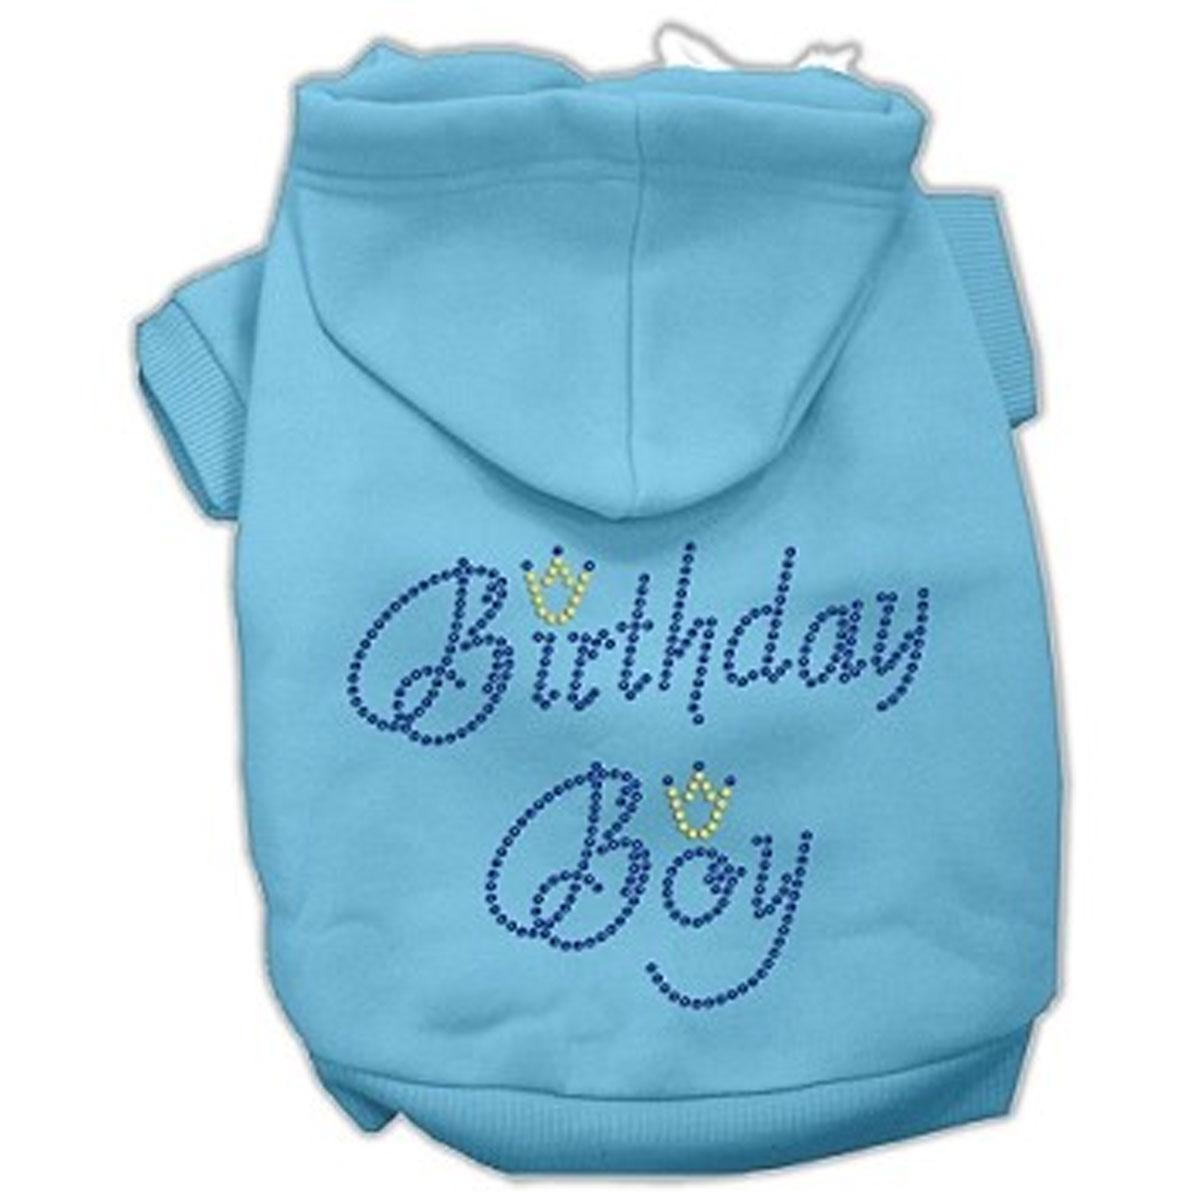 Birthday Boy Rhinestone Dog Hoodie - Baby Blue